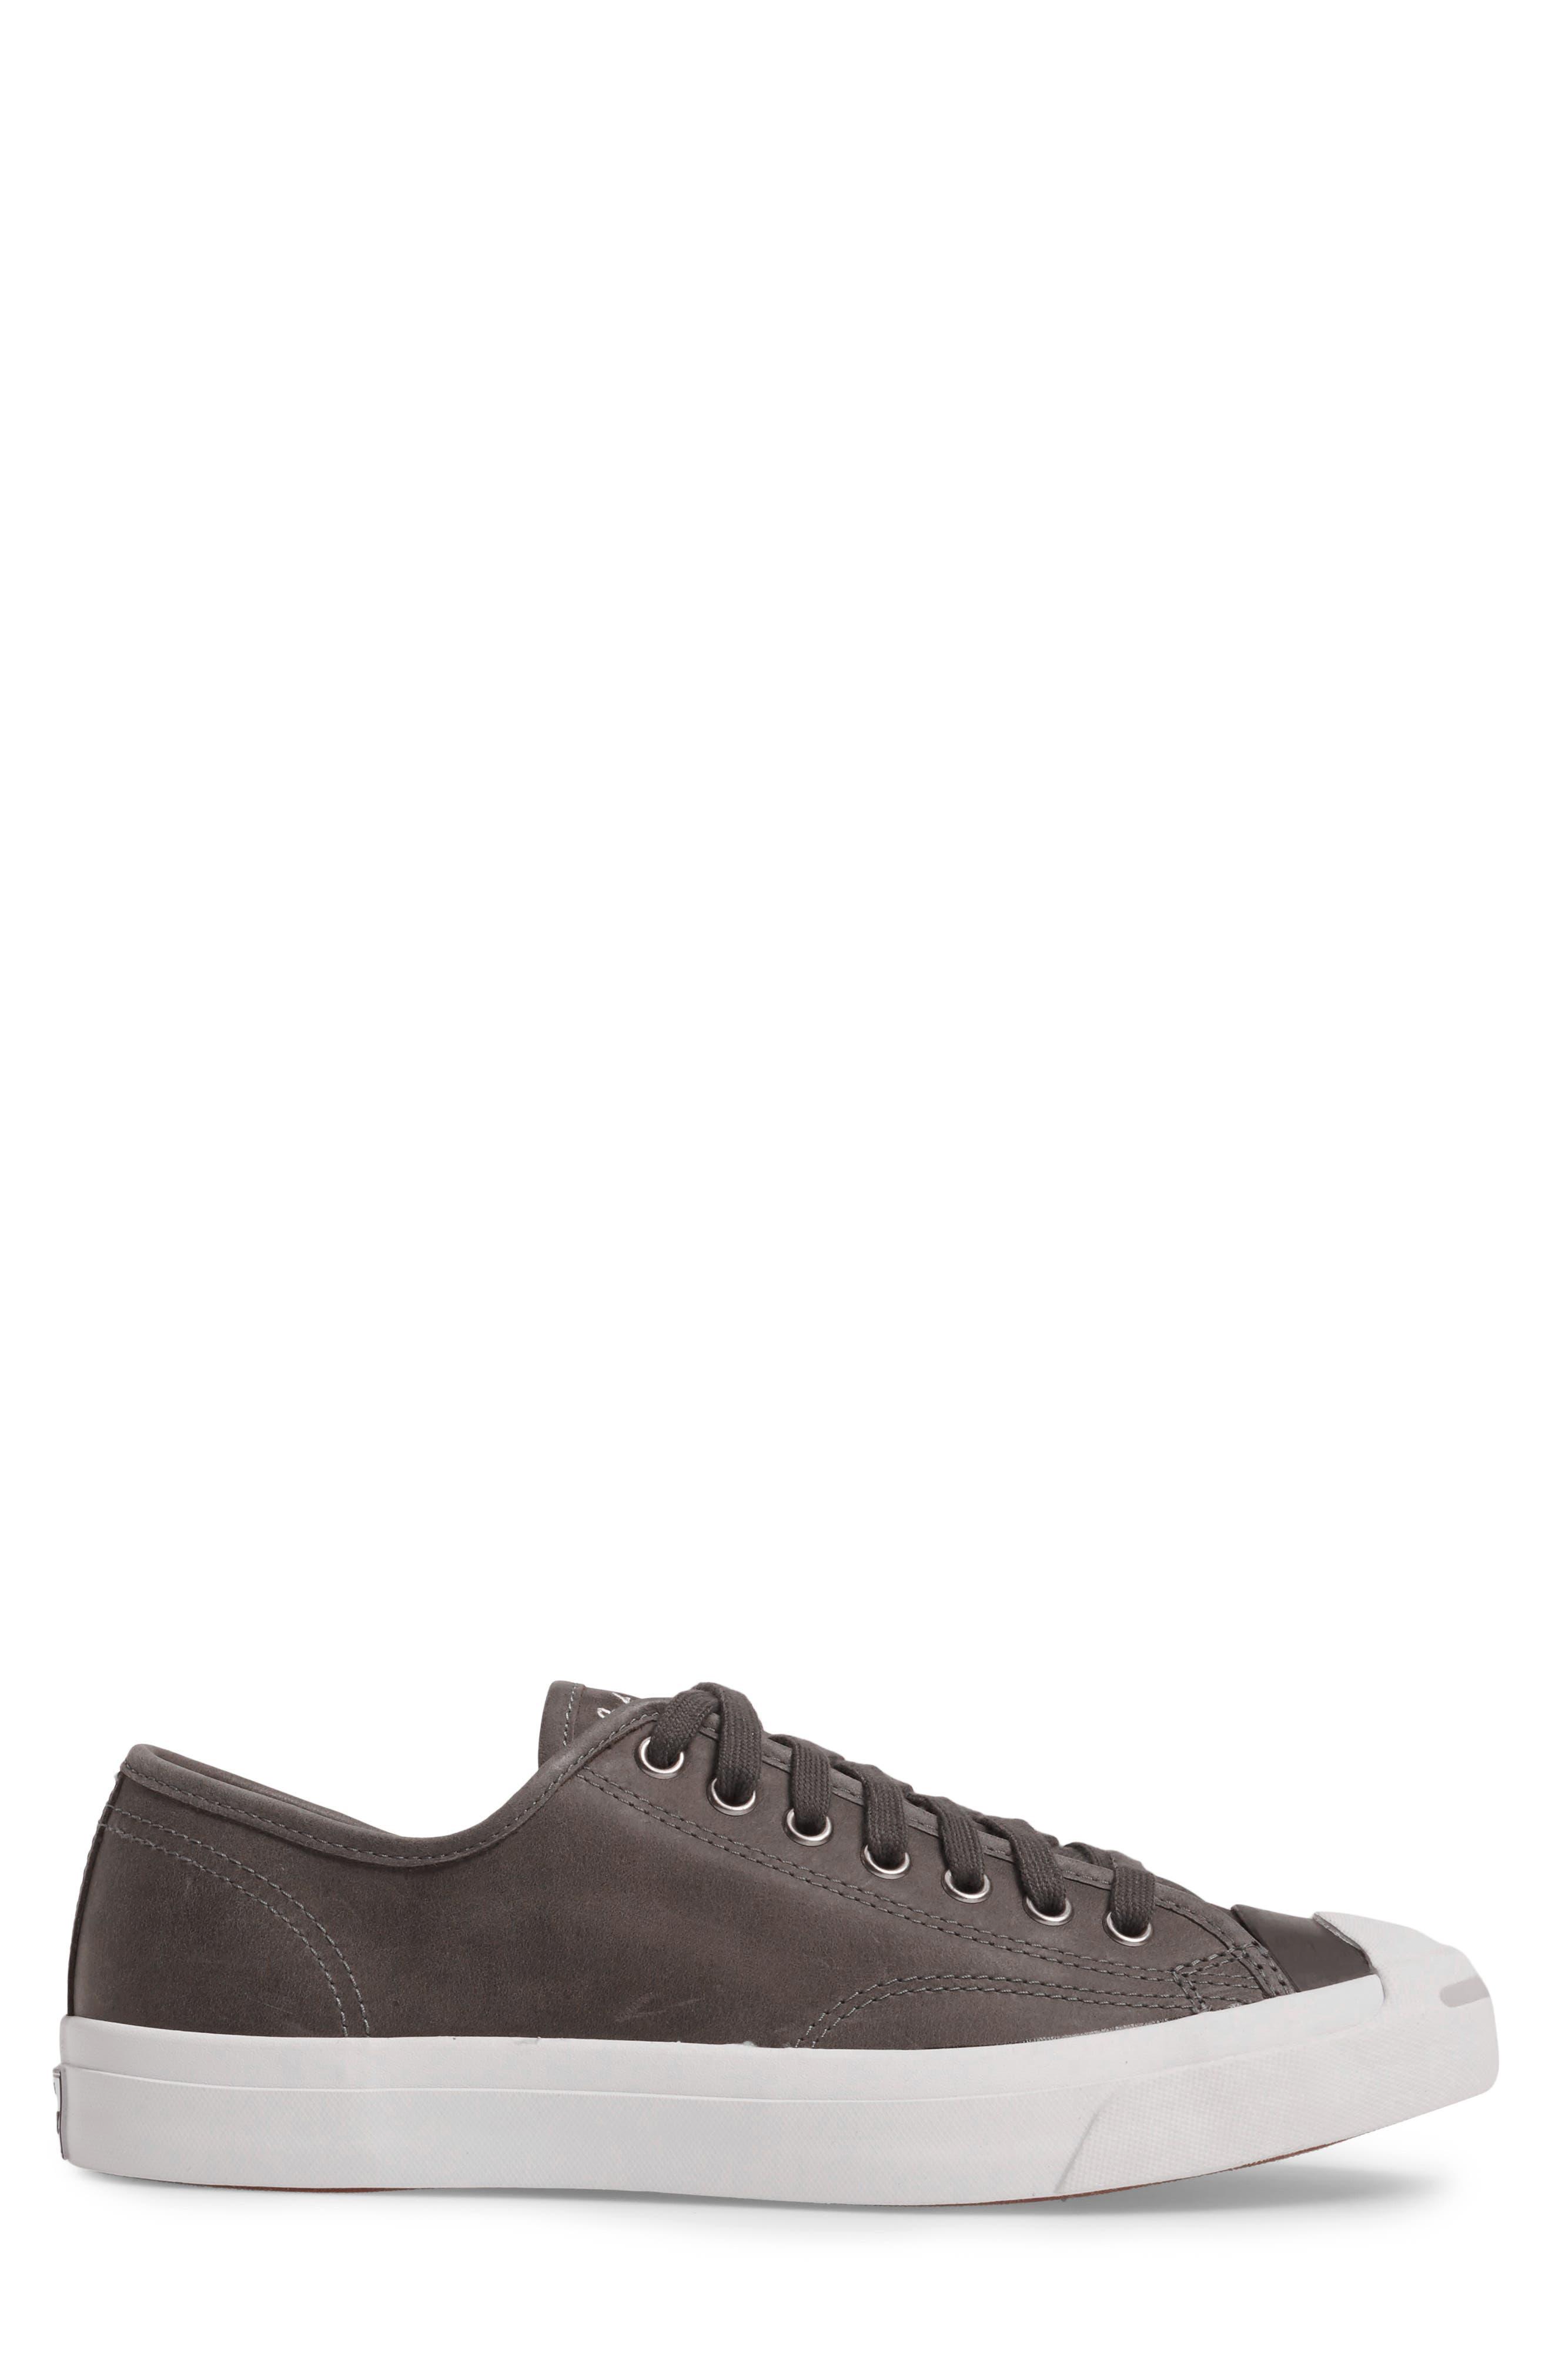 Alternate Image 3  - Converse 'Jack Purcell - Jack' Sneaker (Men)